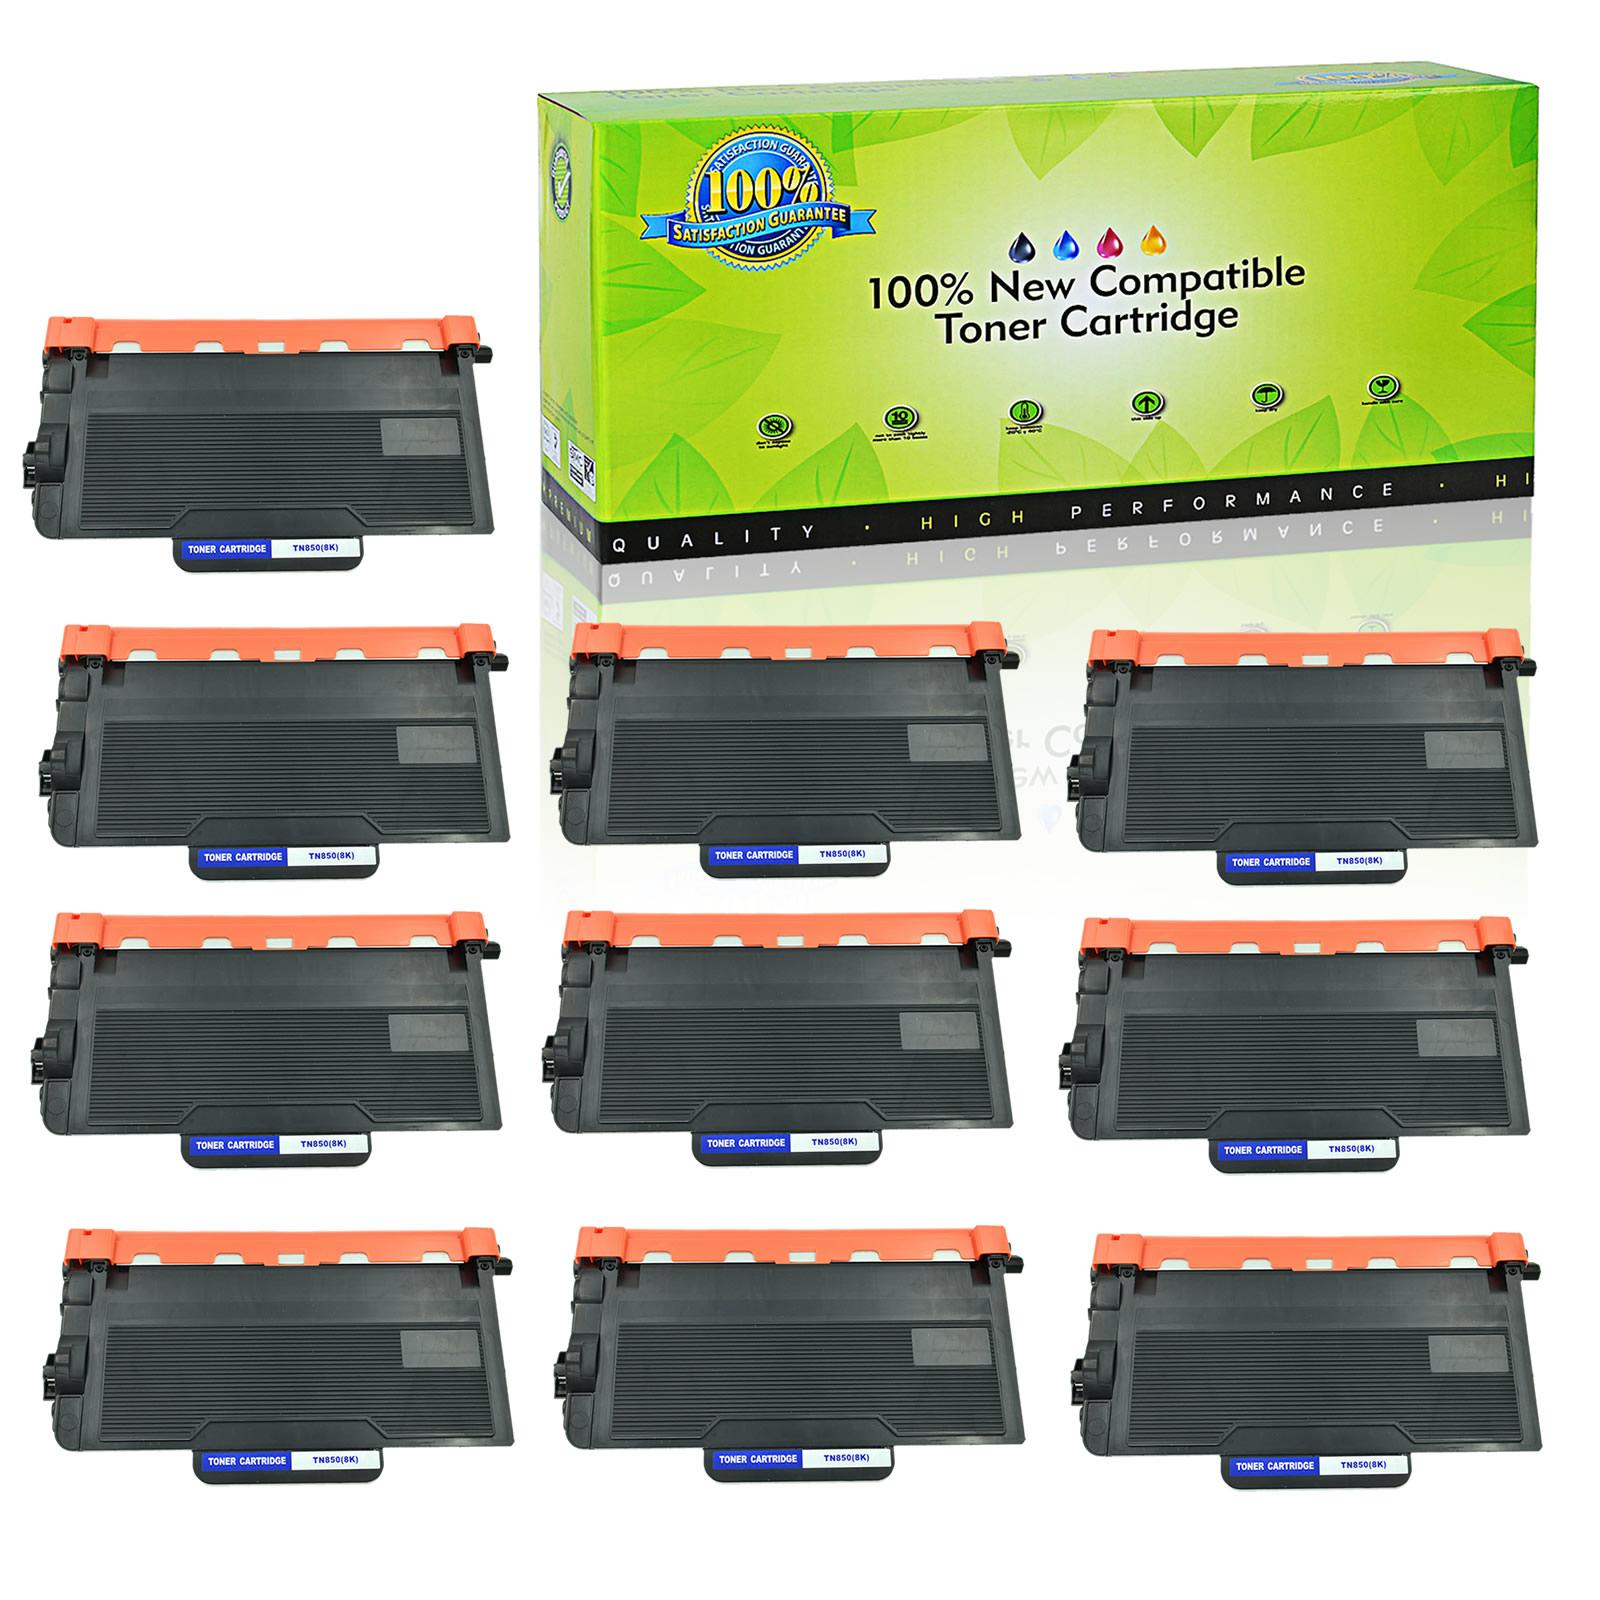 4 pk TN850 Toner Cartridge fit Brother HL-L5000D HL-L5200DW Printer HIGH QUALITY